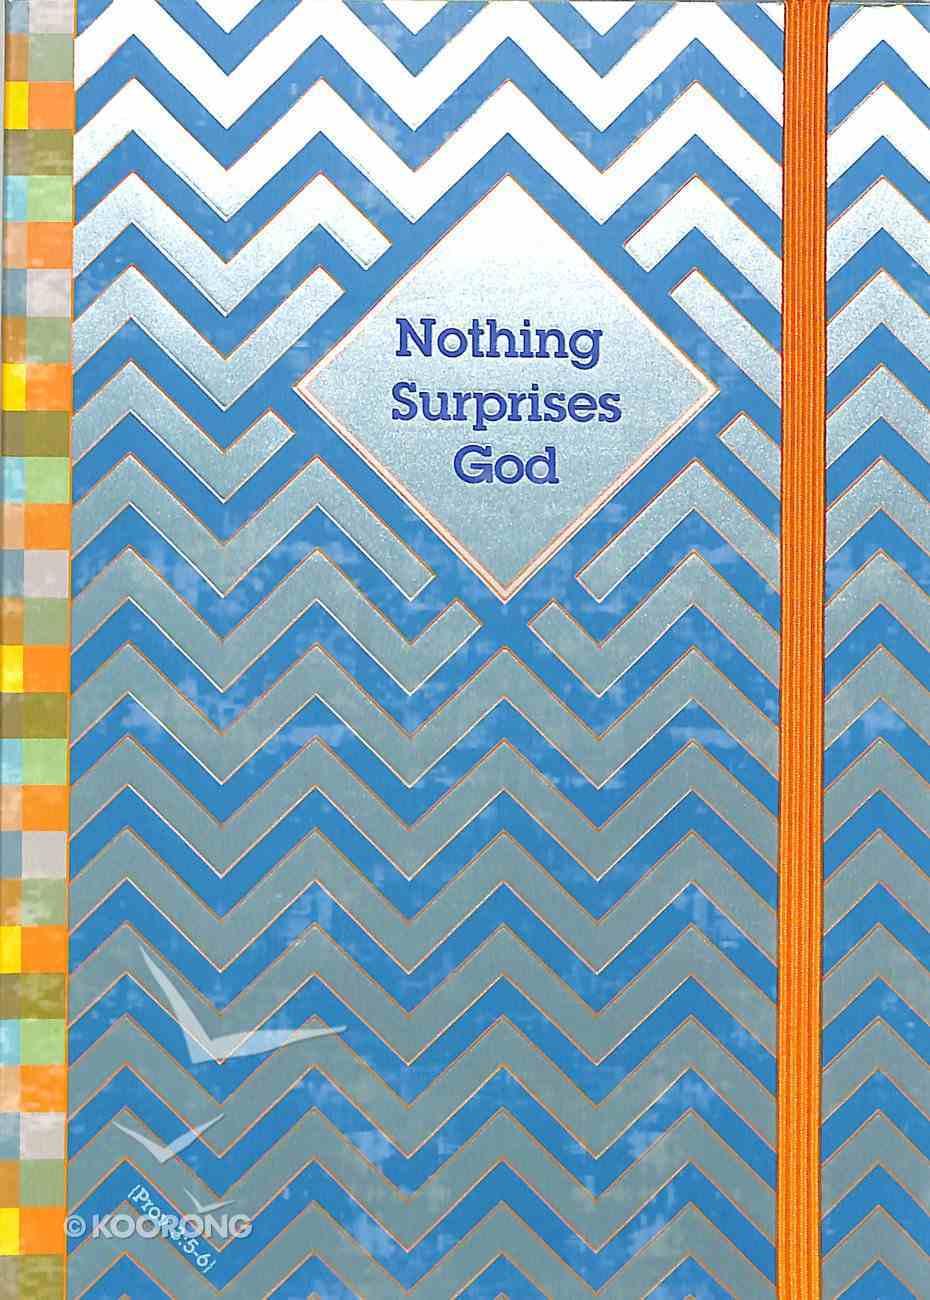 Notebook Journal: Nothing Surprises God With Gold Elastic Closure Hardback